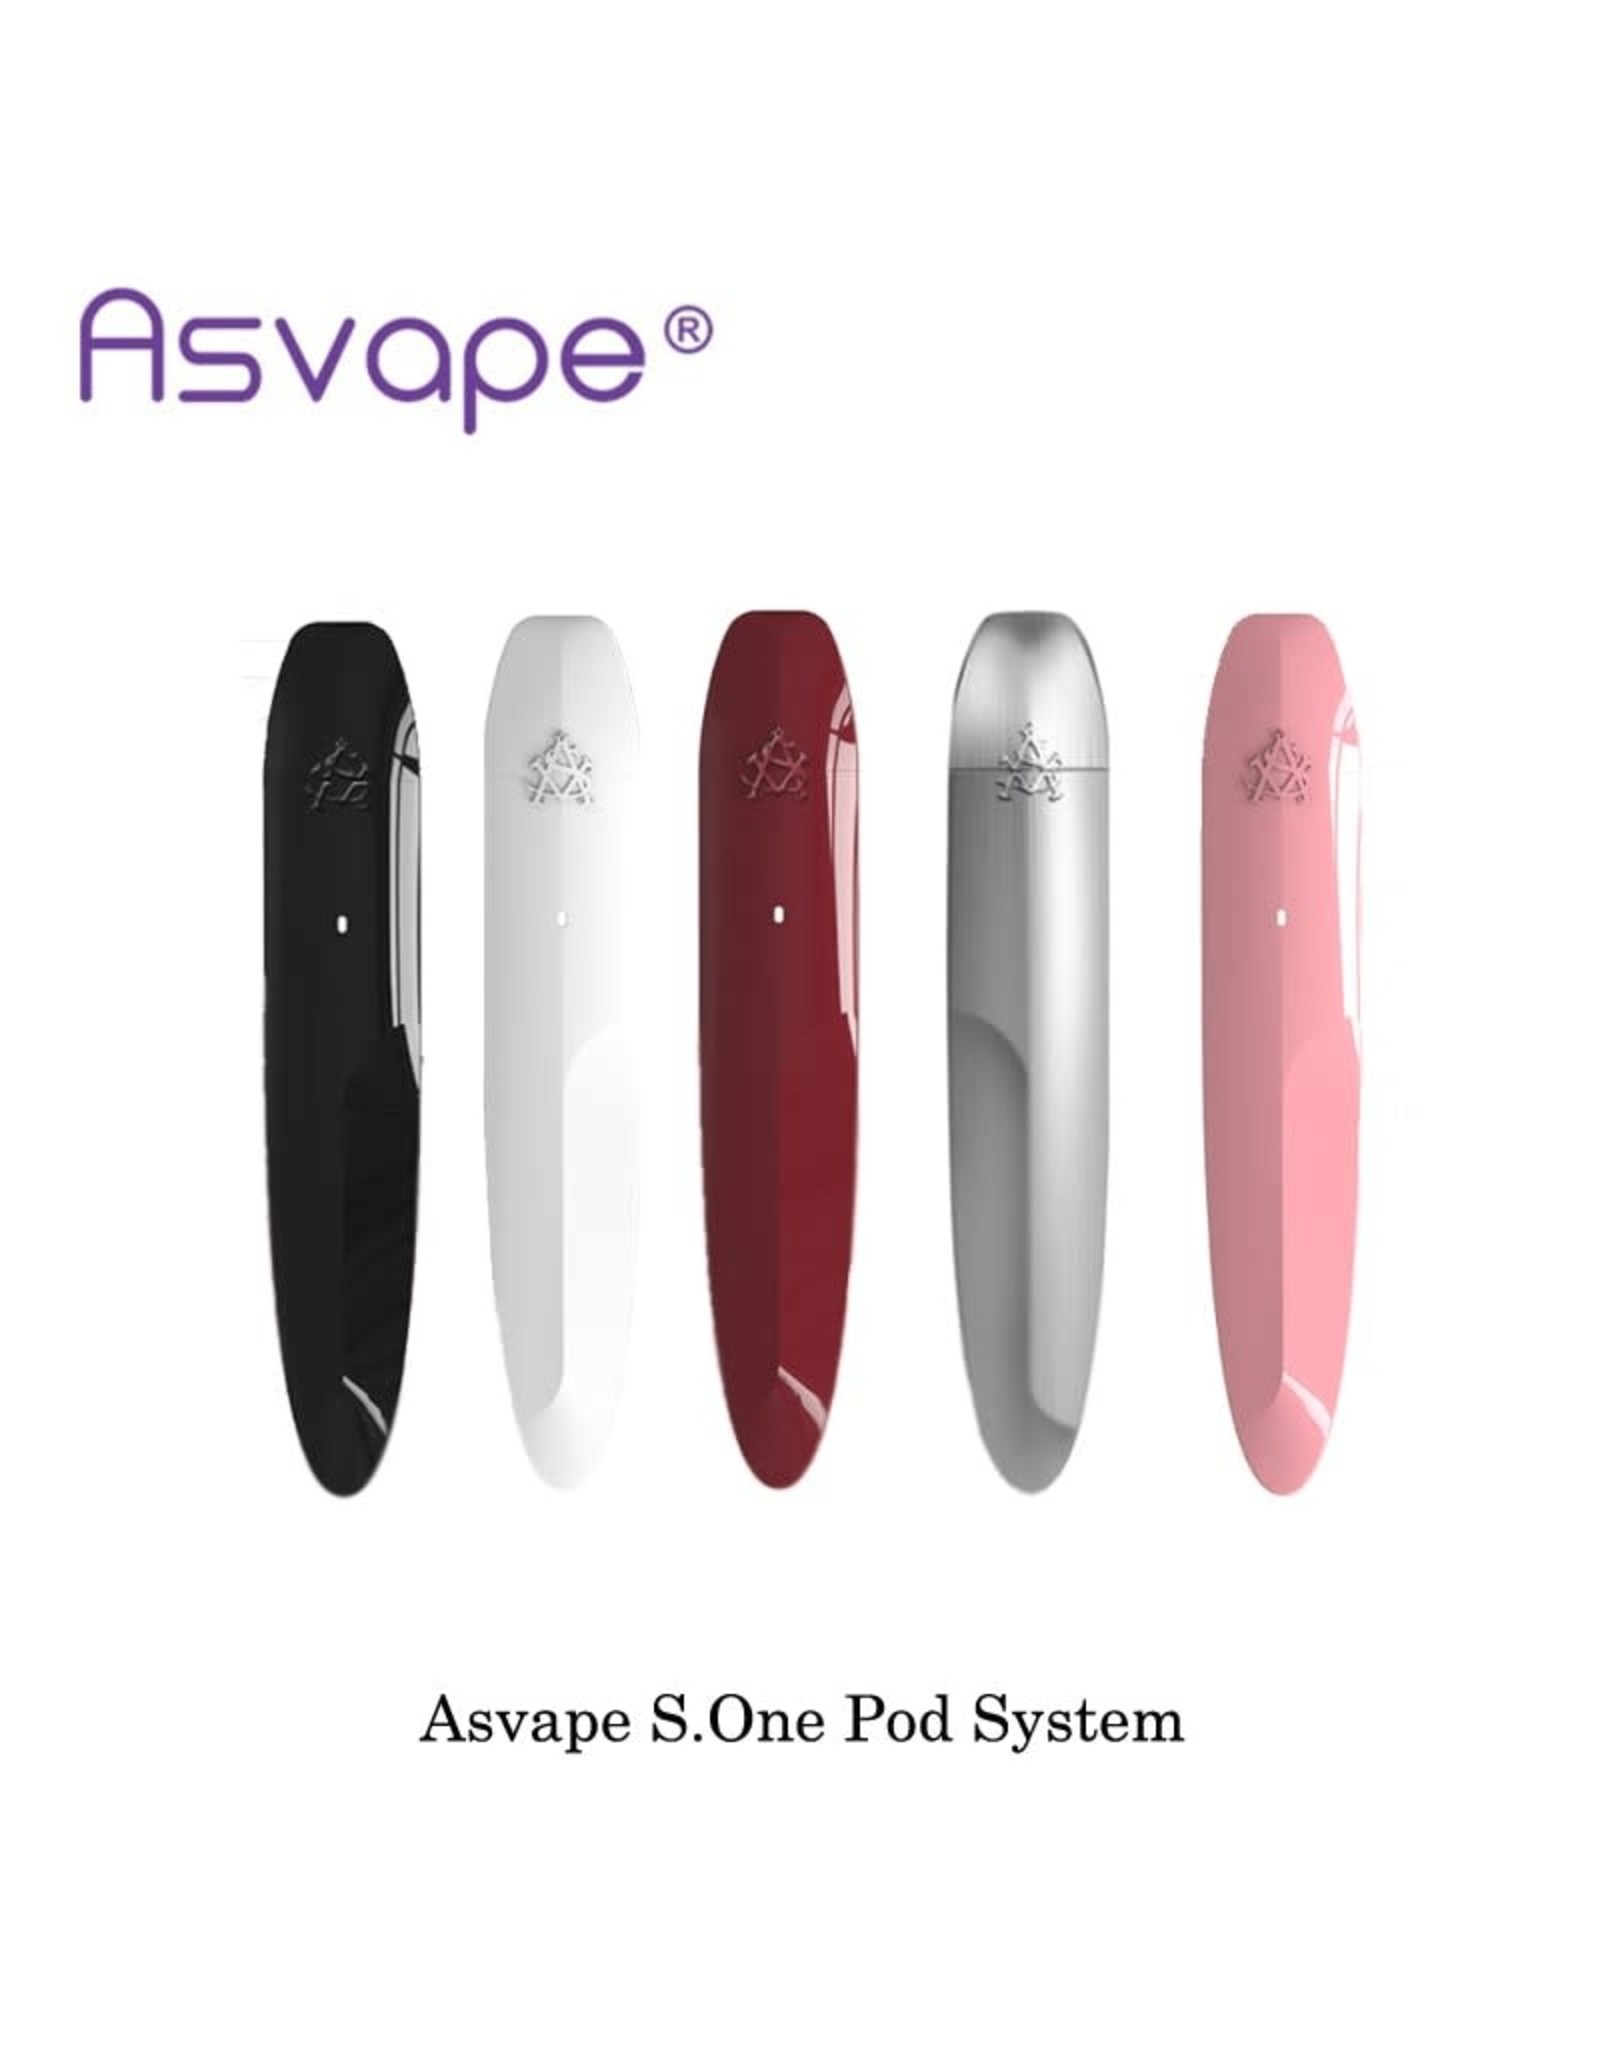 ASAVAPE ASVAPE S.ONE RED POD KIT